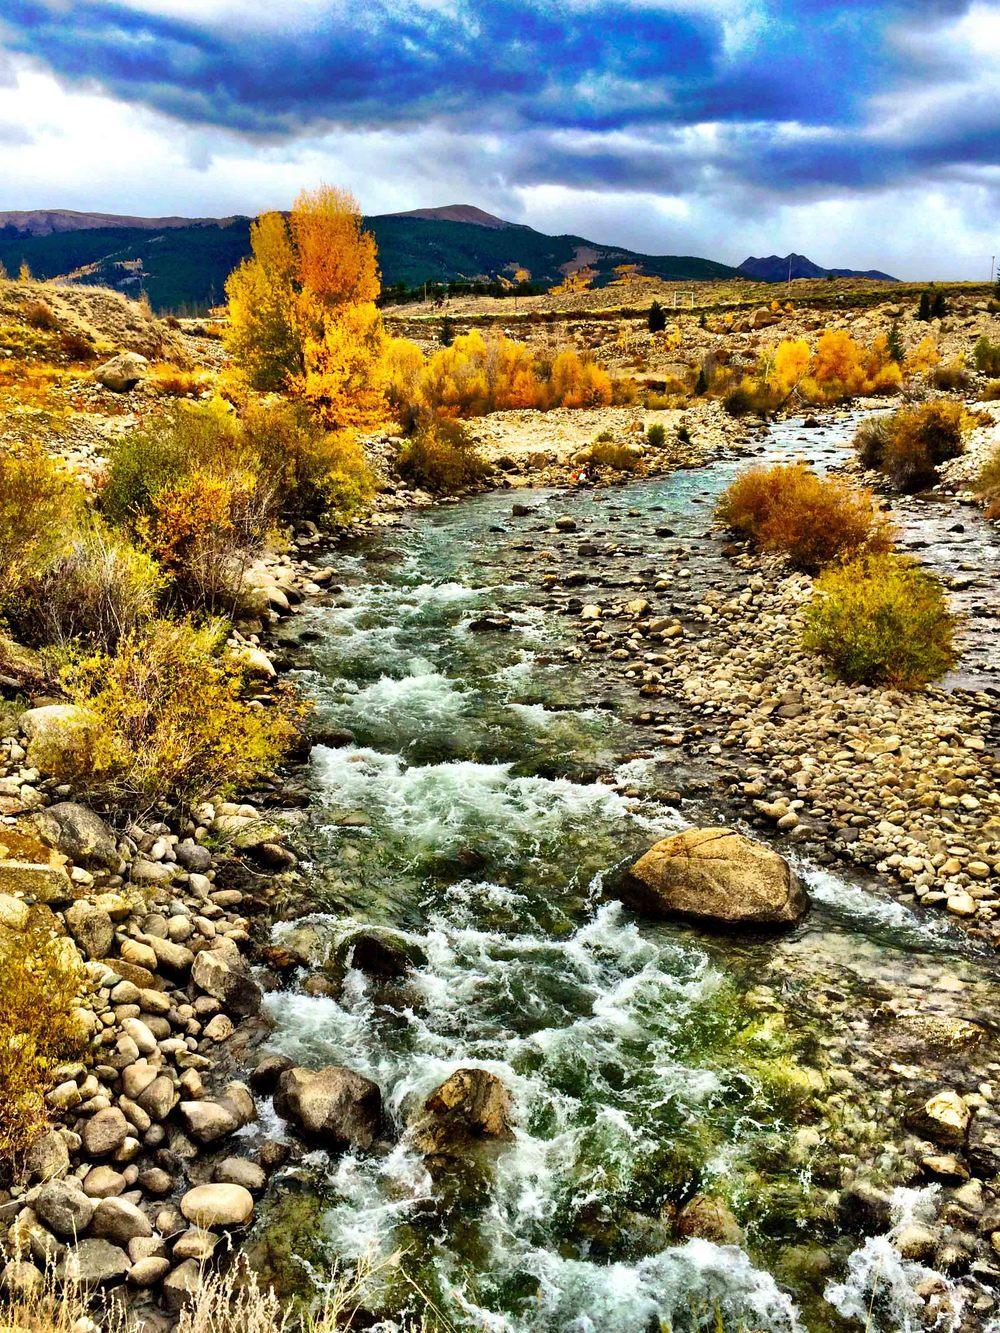 Collegiate Range, Colorado, September 2015